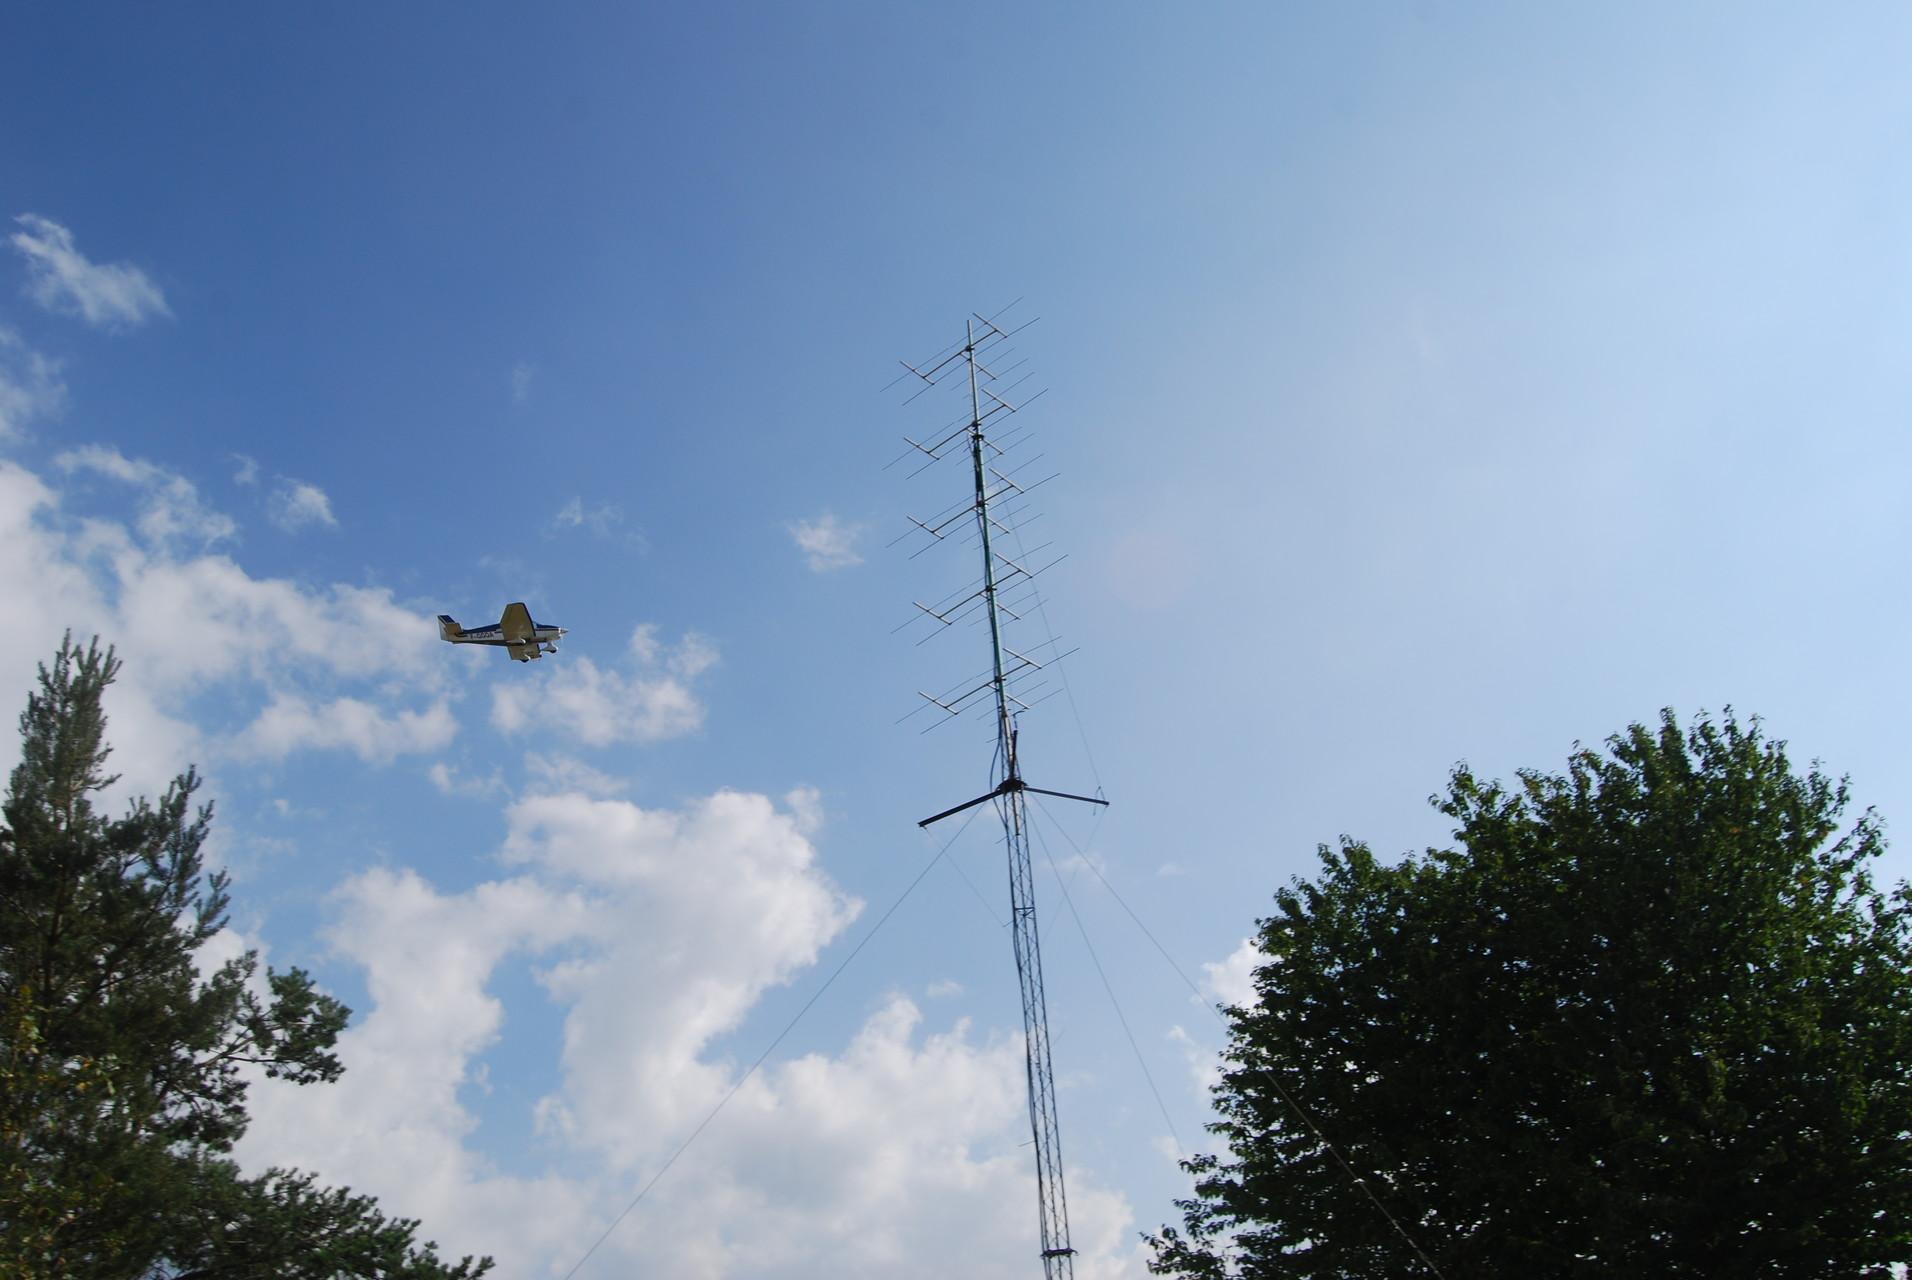 F5RMY flying over antennas